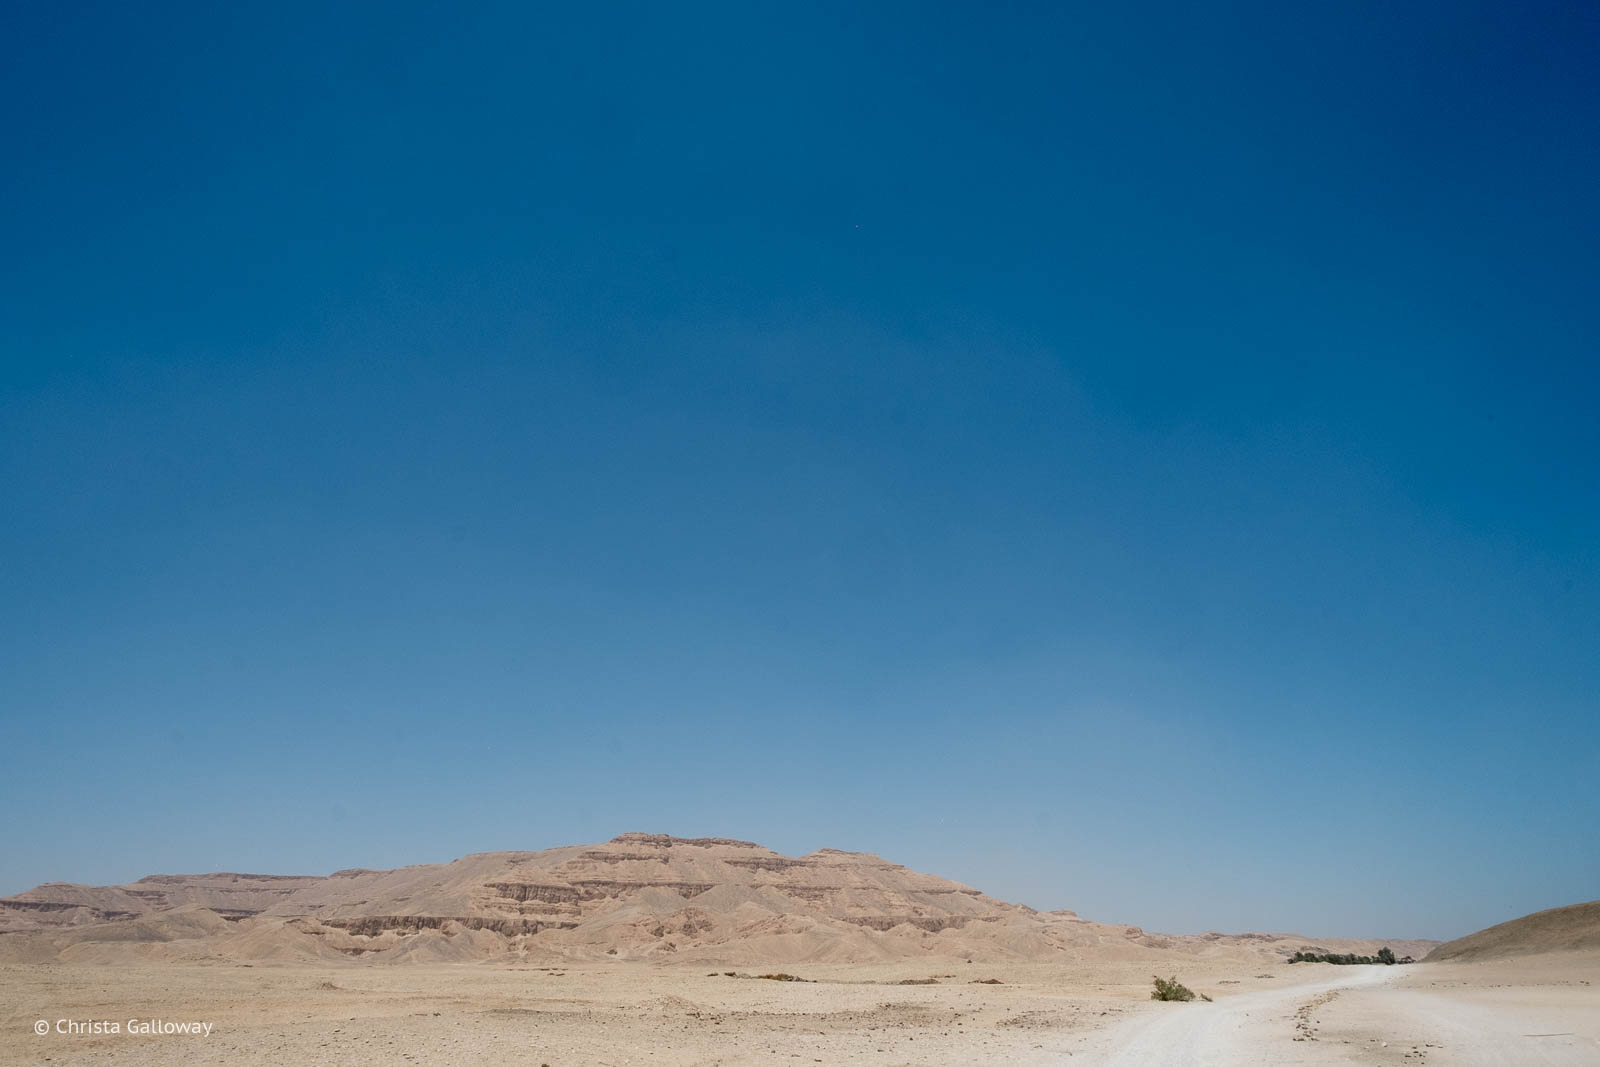 desert-monastary-luxor-ckgalloway-3522.jpg